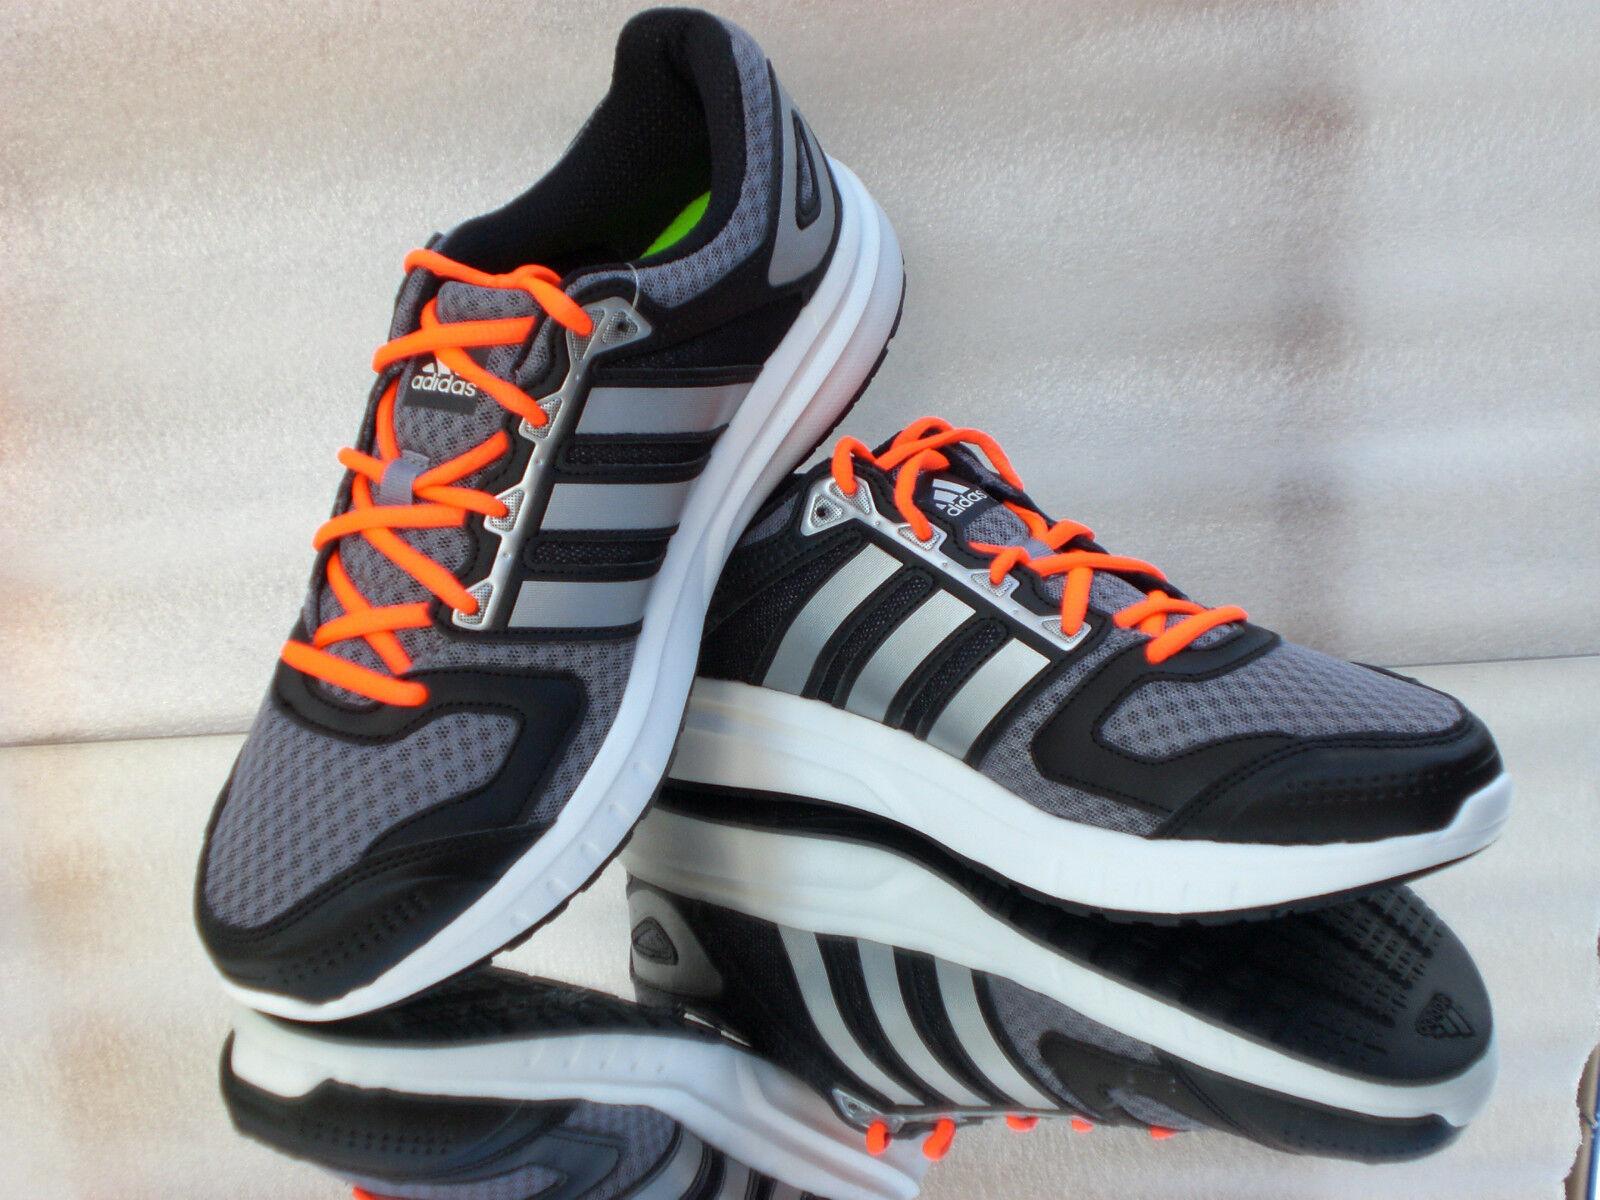 ADIDAS Galaxy M18659 Turn-Laufschuhe Sneaker grey core core core black Neu Gr  39-48 26ca46